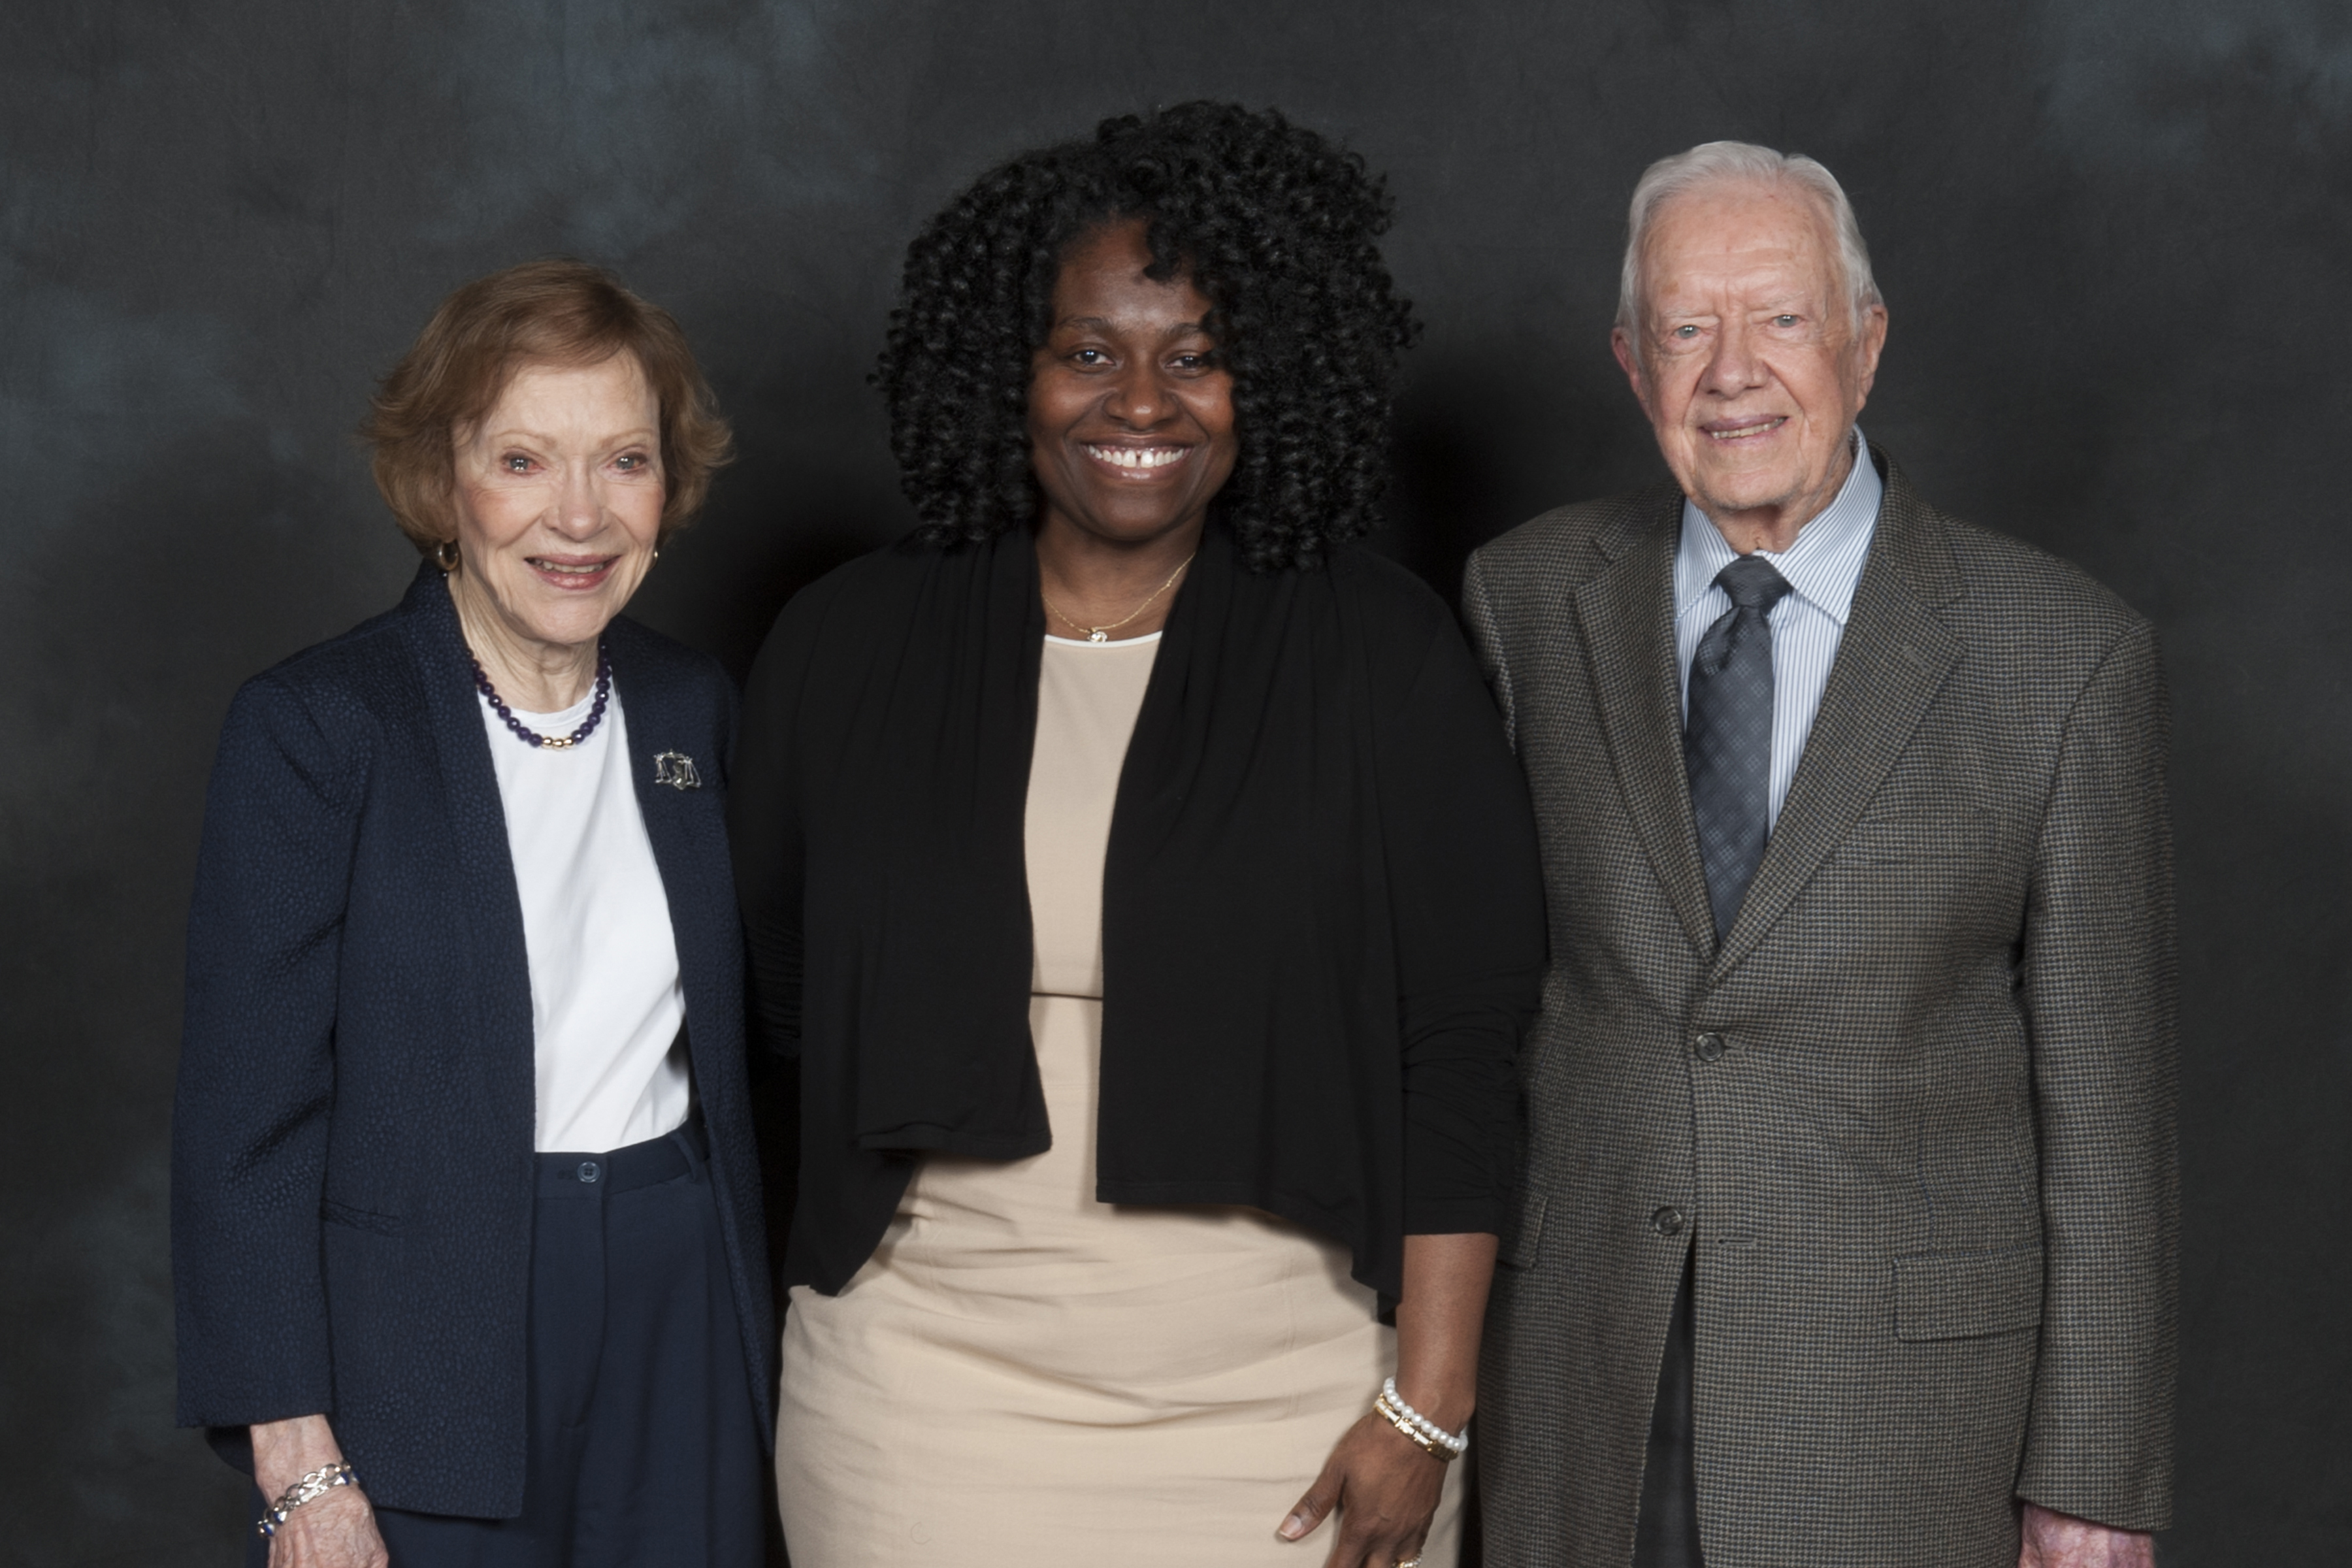 President Jimmy Carter, Pamla DL Johnson, and First Lady Rosalynn Carter